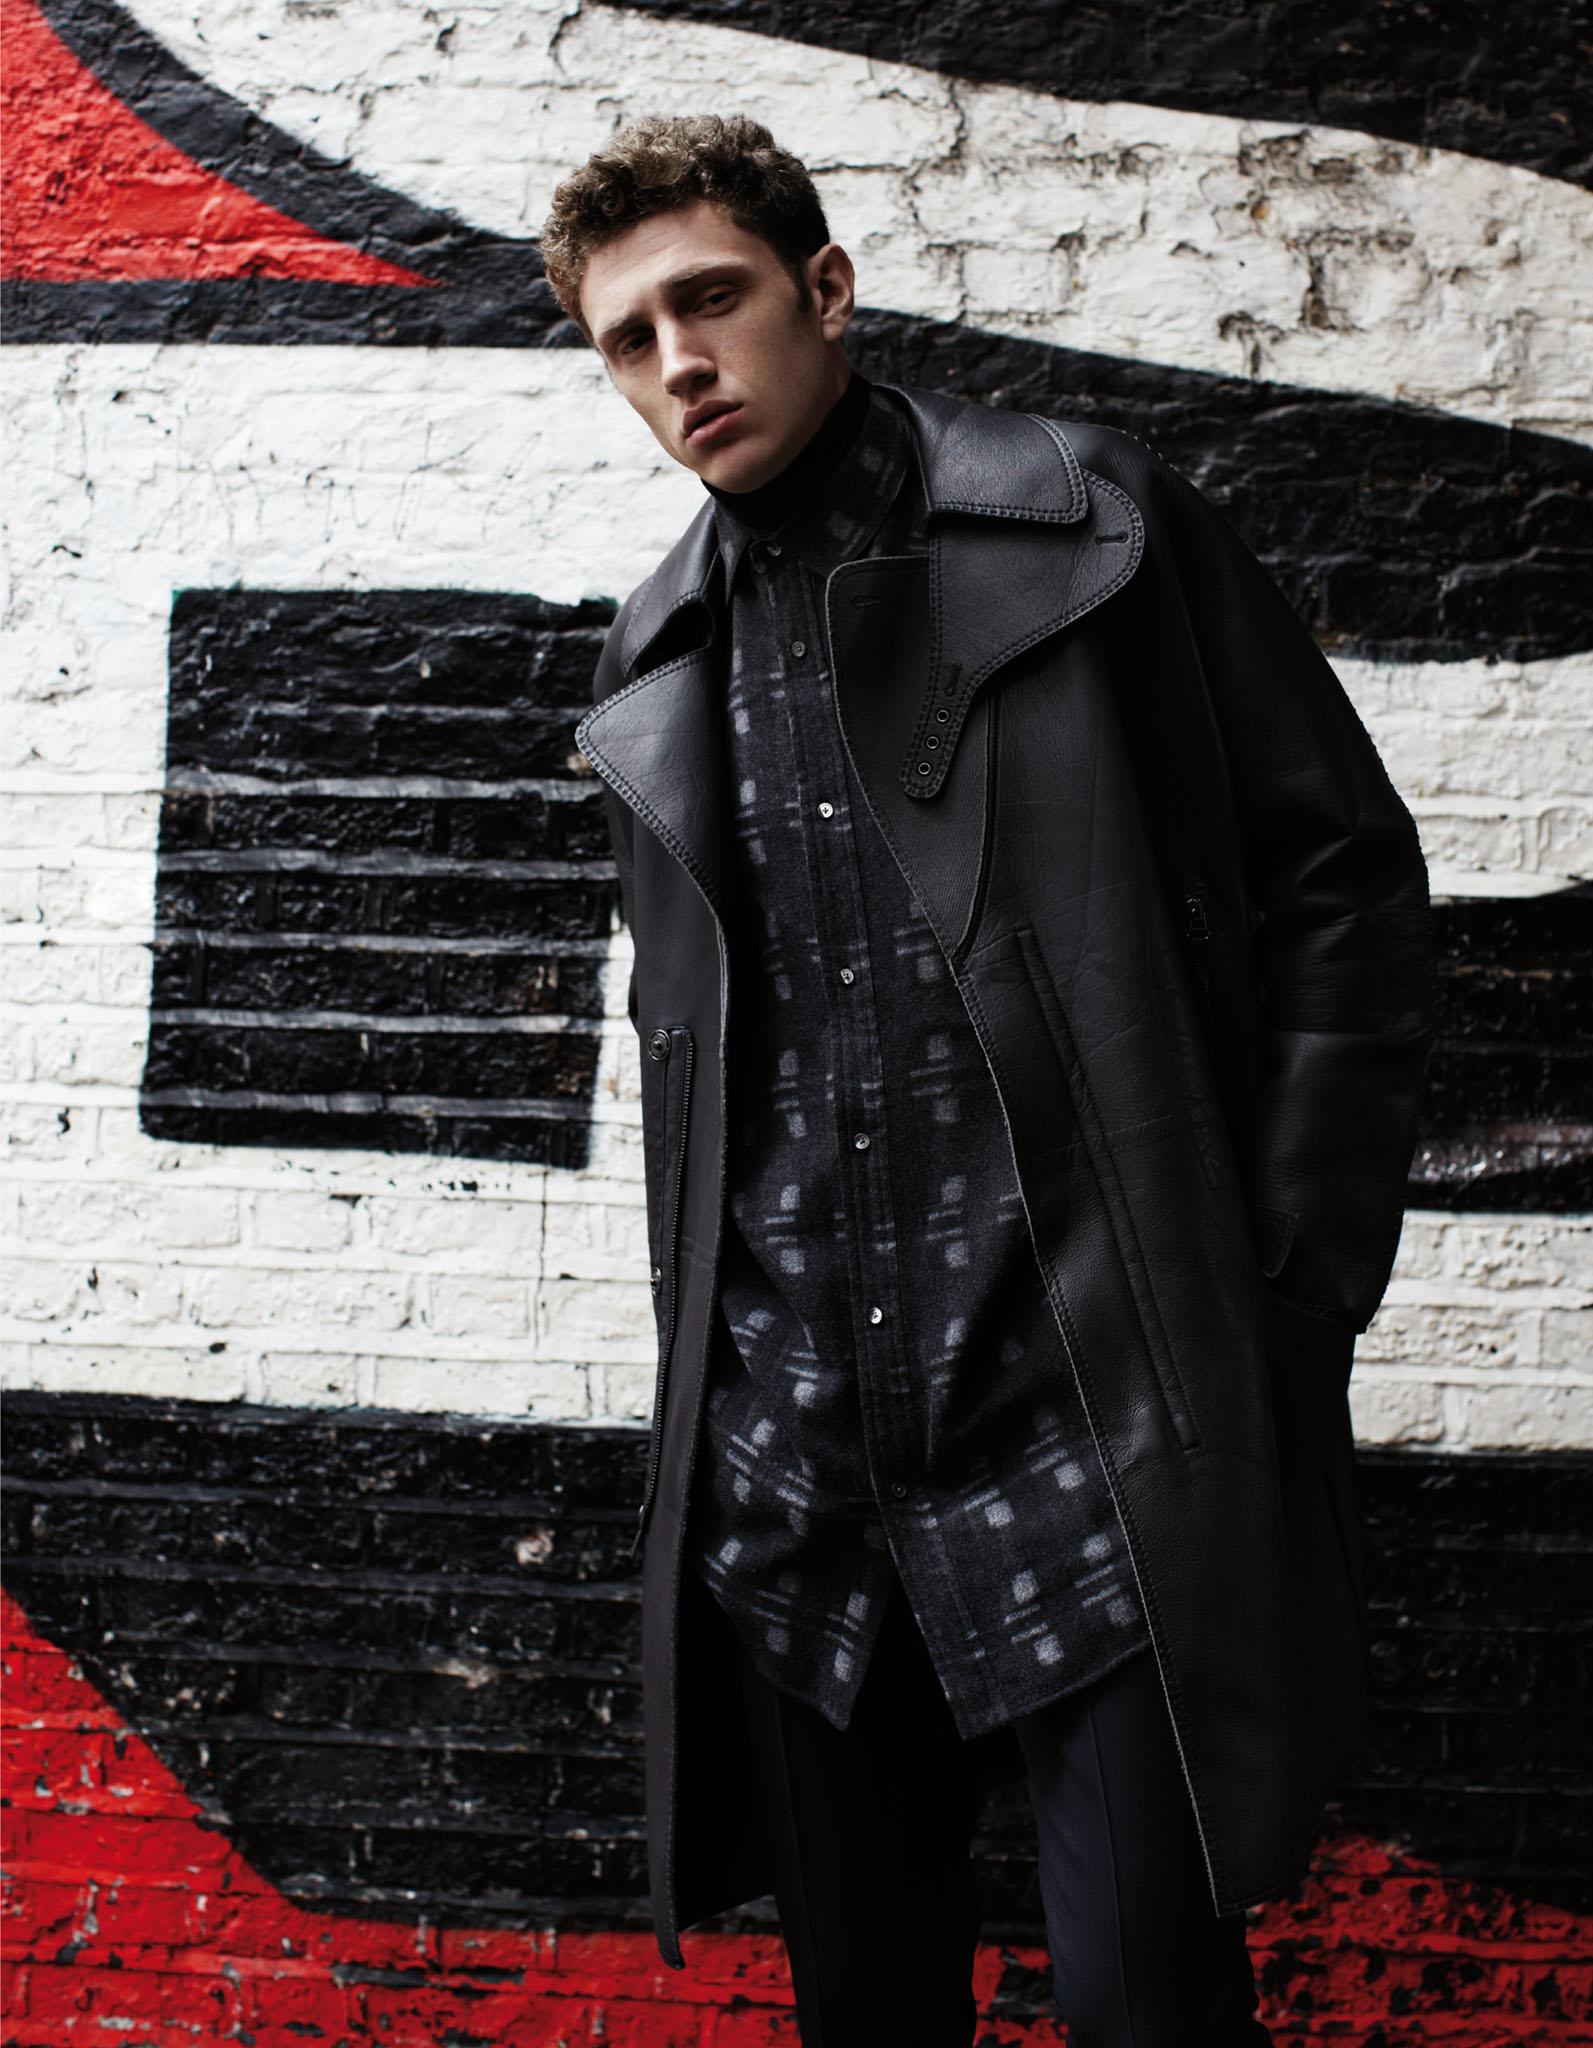 PRINTEMPS Catalogue Homme London Mania. Mode Homme Lanvin, Alexander Wang, Melinda Gloss